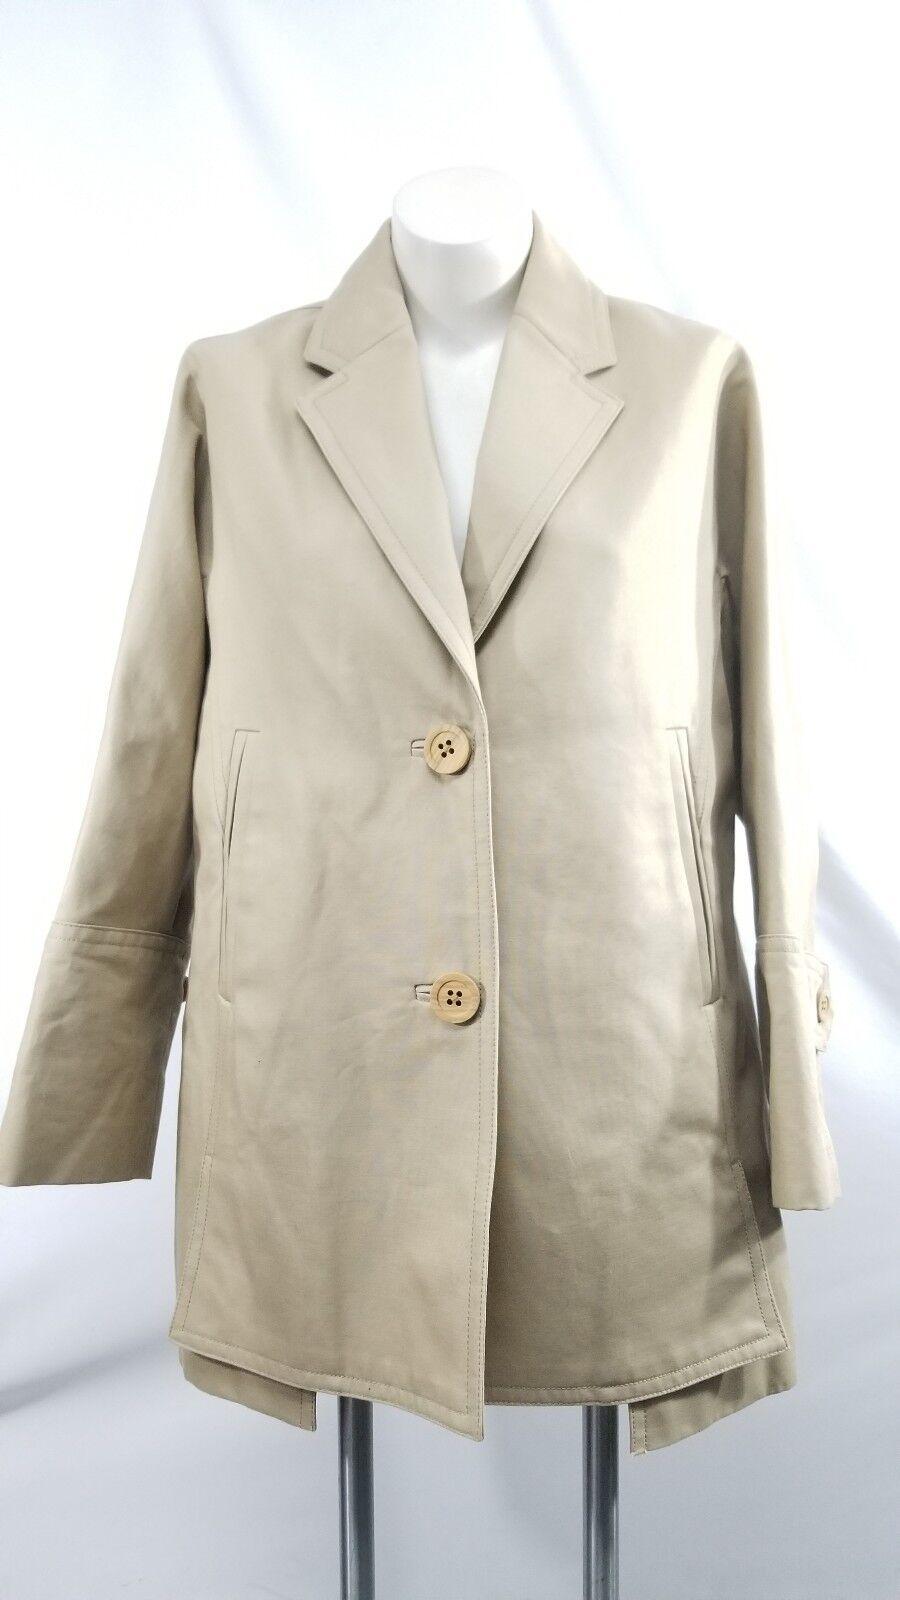 J. Crew women's Bonded Cotton Trench coat coat coat khaki tan lined wood buttons size 12P 91562c